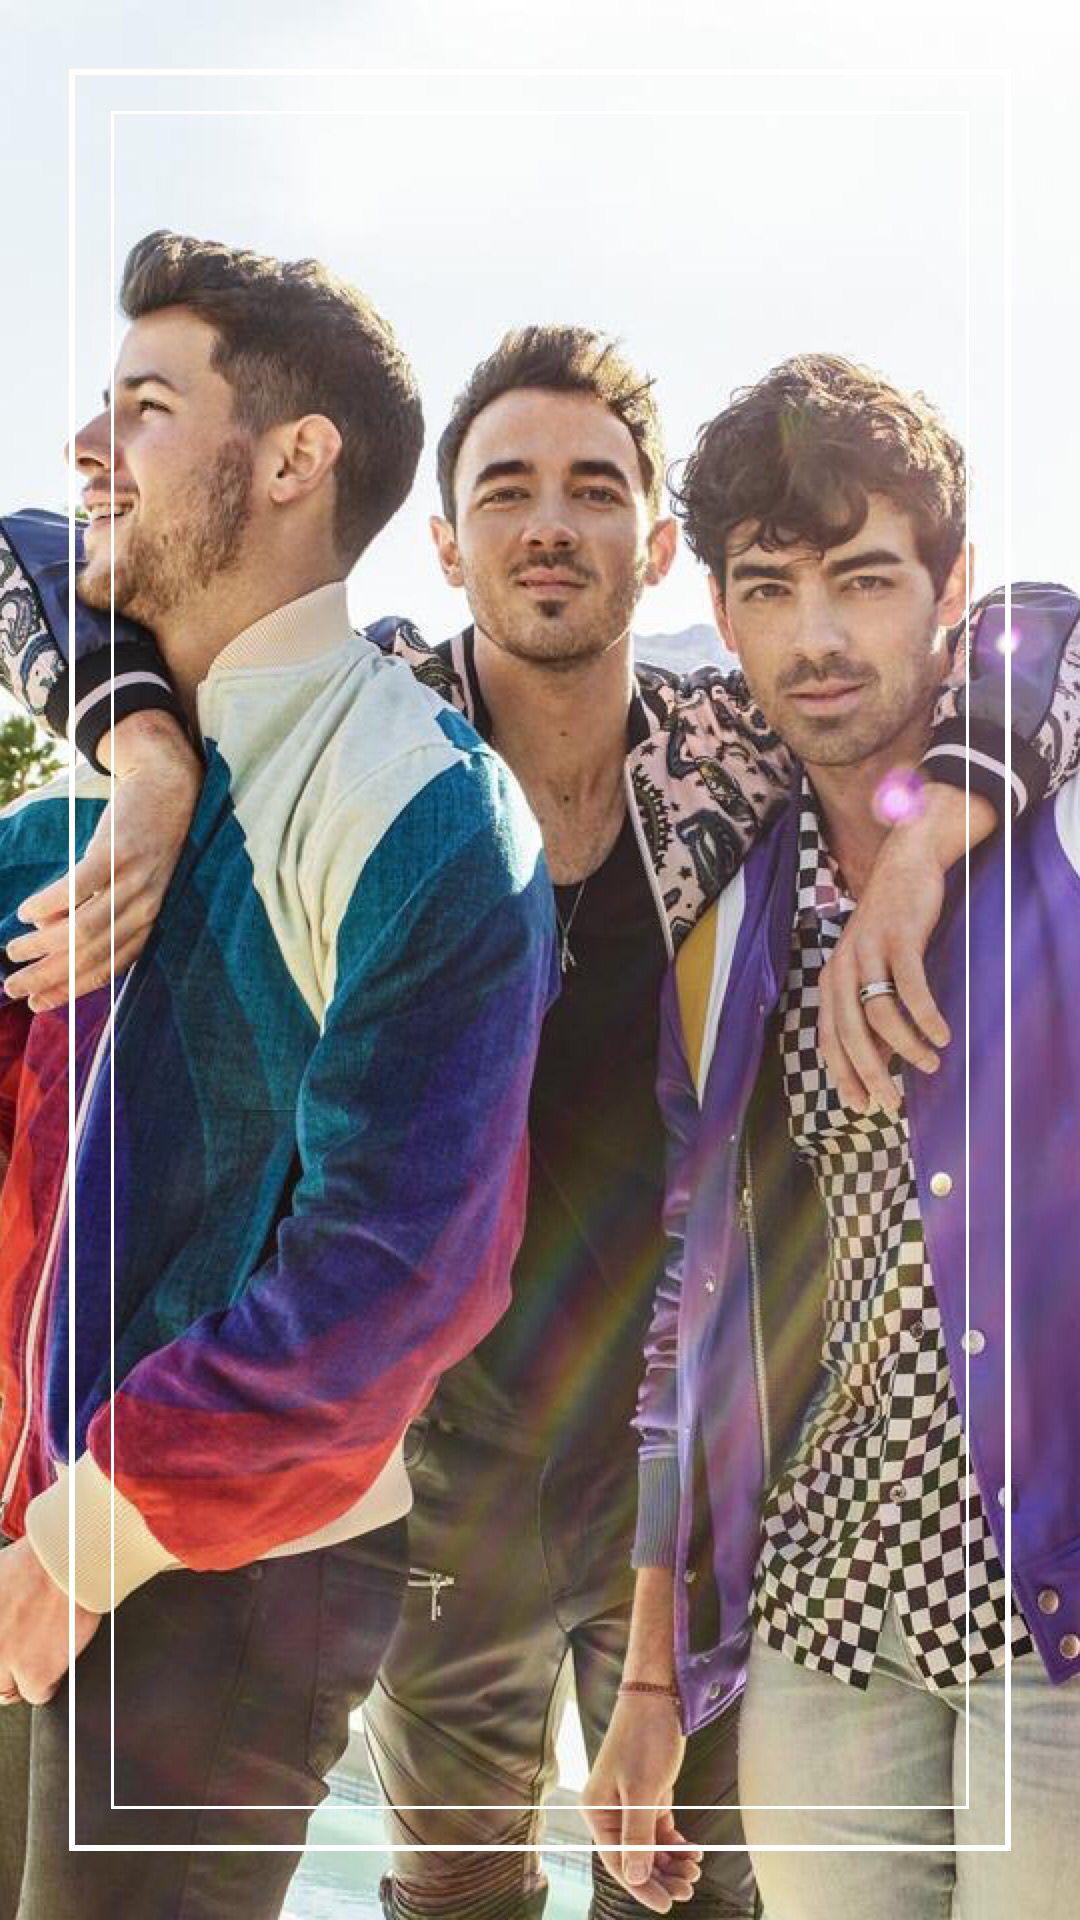 f528d3b6c Jonas #jonasbrothers #music | jonas brothers ❤ in 2019 | Nick ...